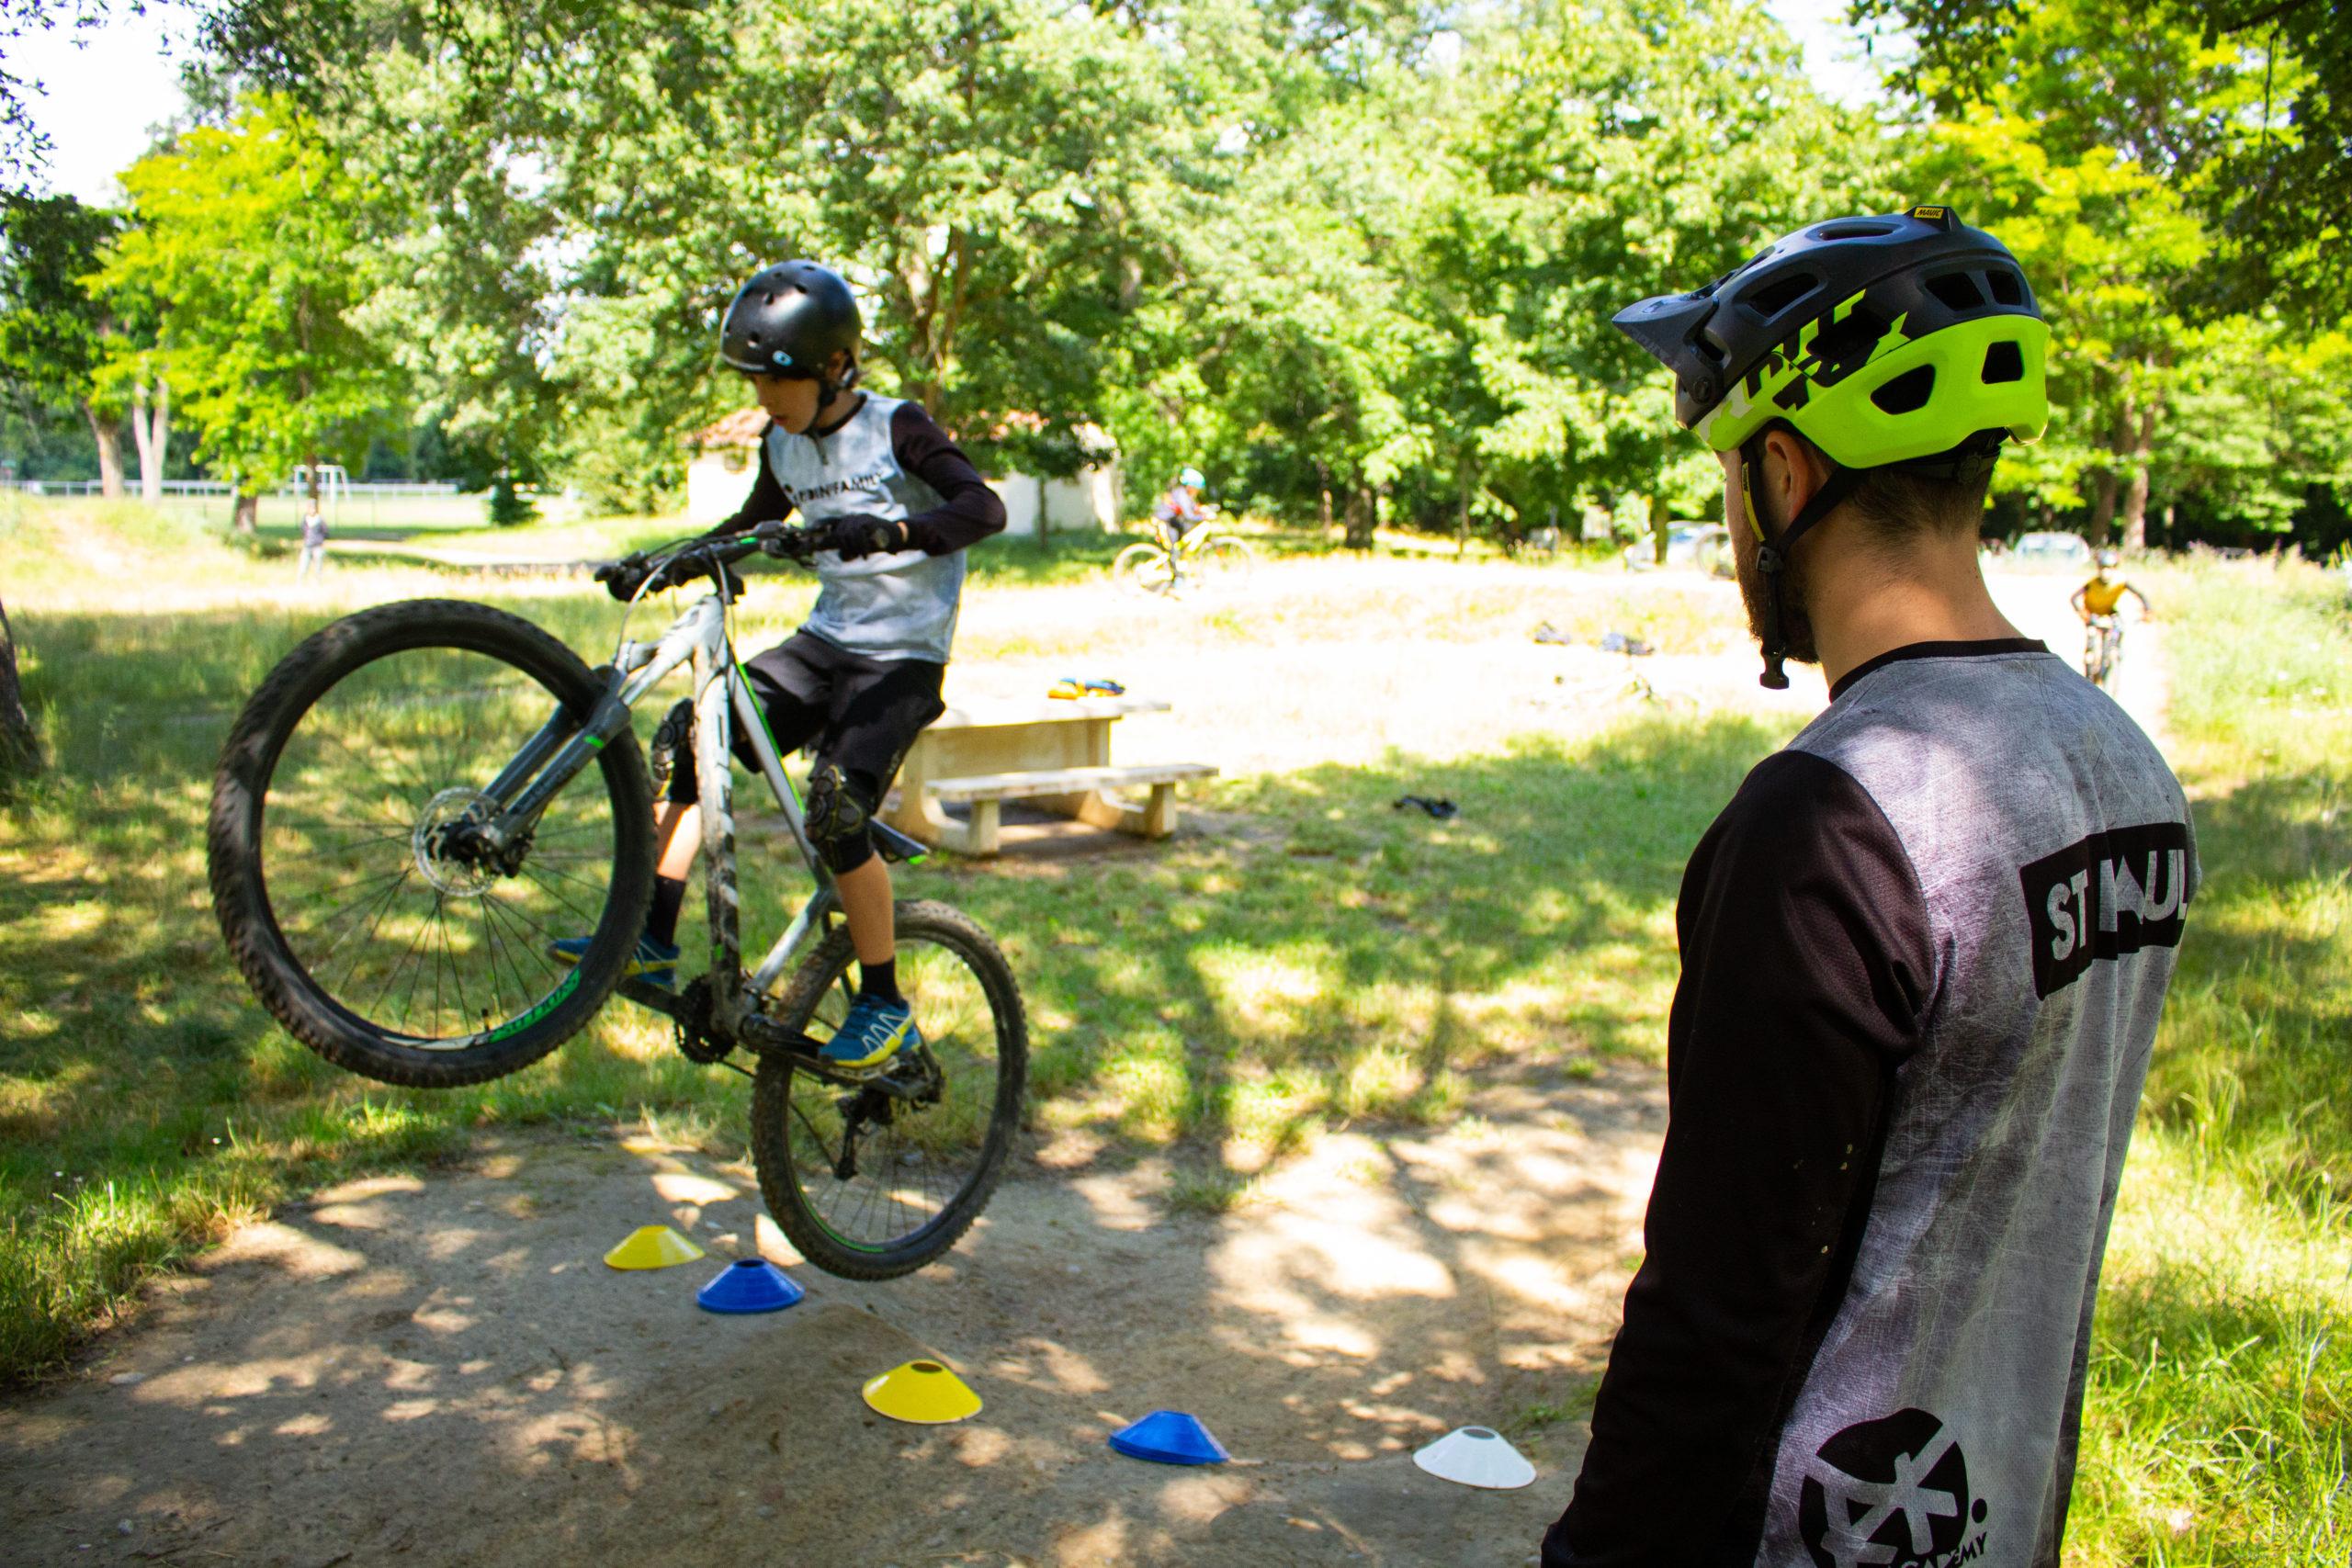 Cours Biker 2 Colomiers Samedi 2020/2021